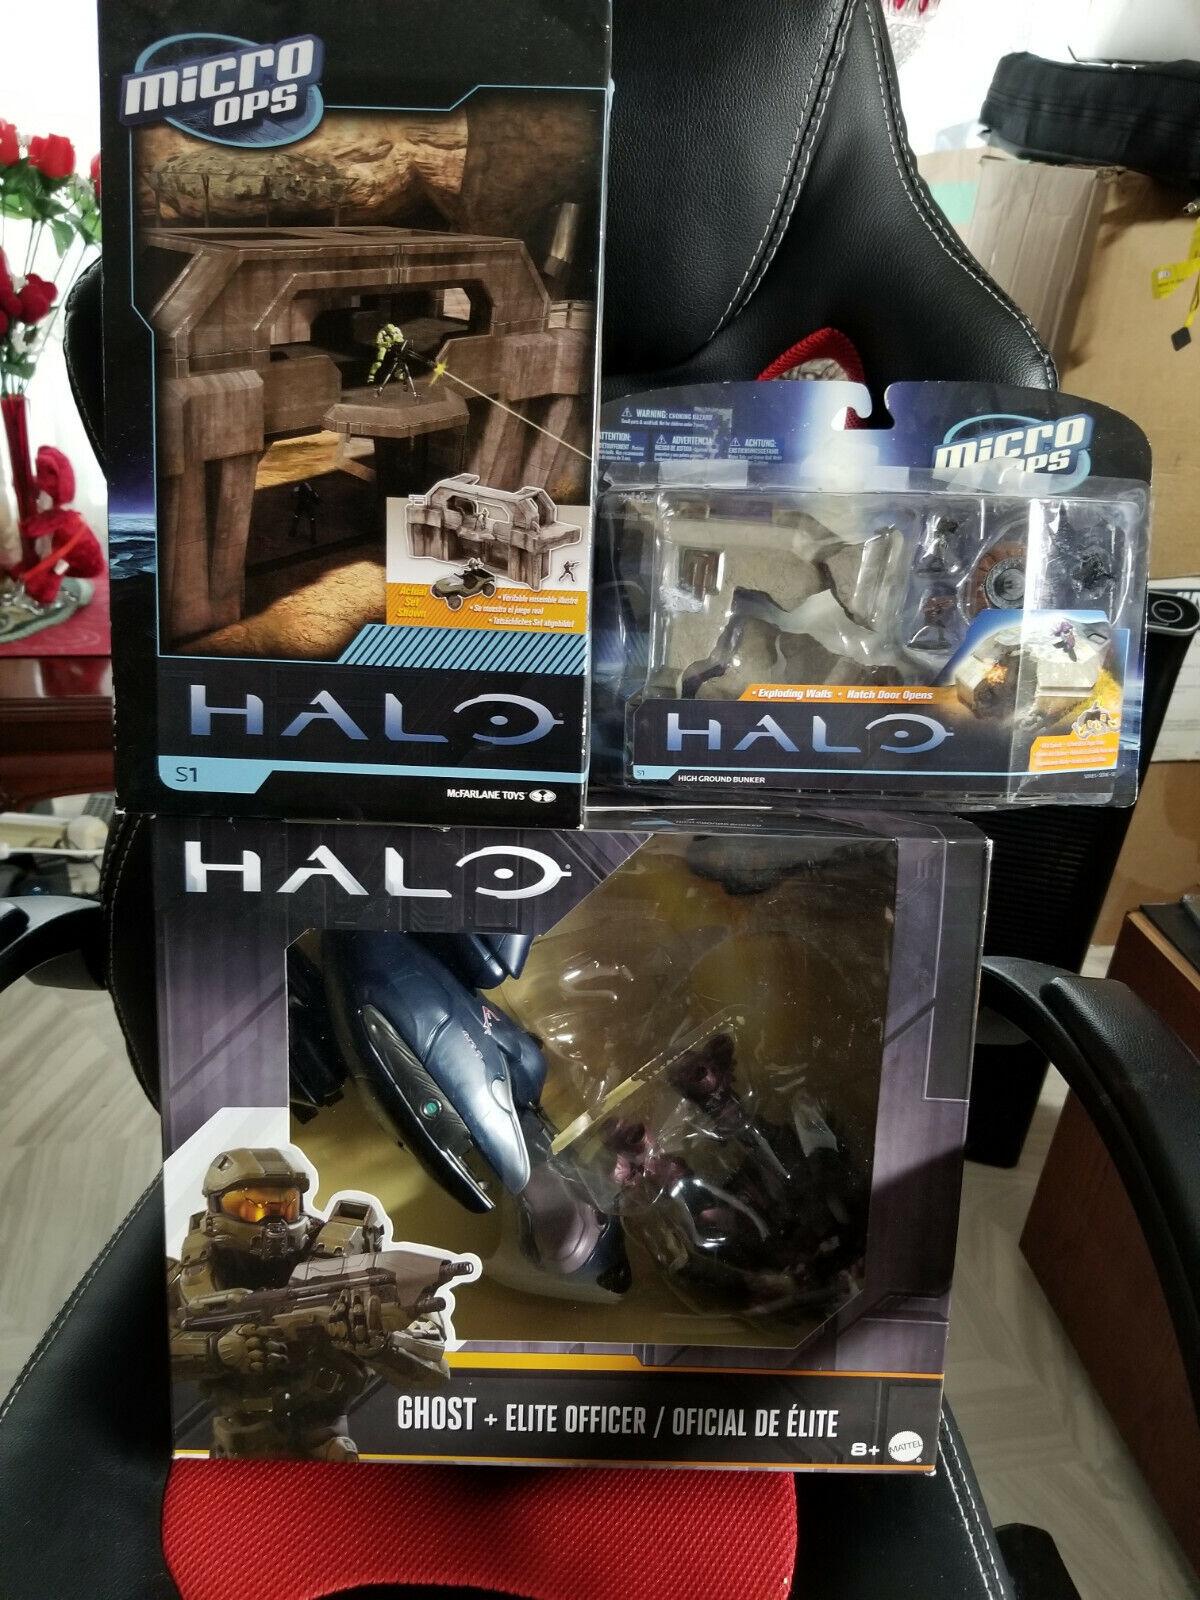 Sellado Raro Halo Ghost + Elite Oficial con 2 Bonus Halo Micro Ops